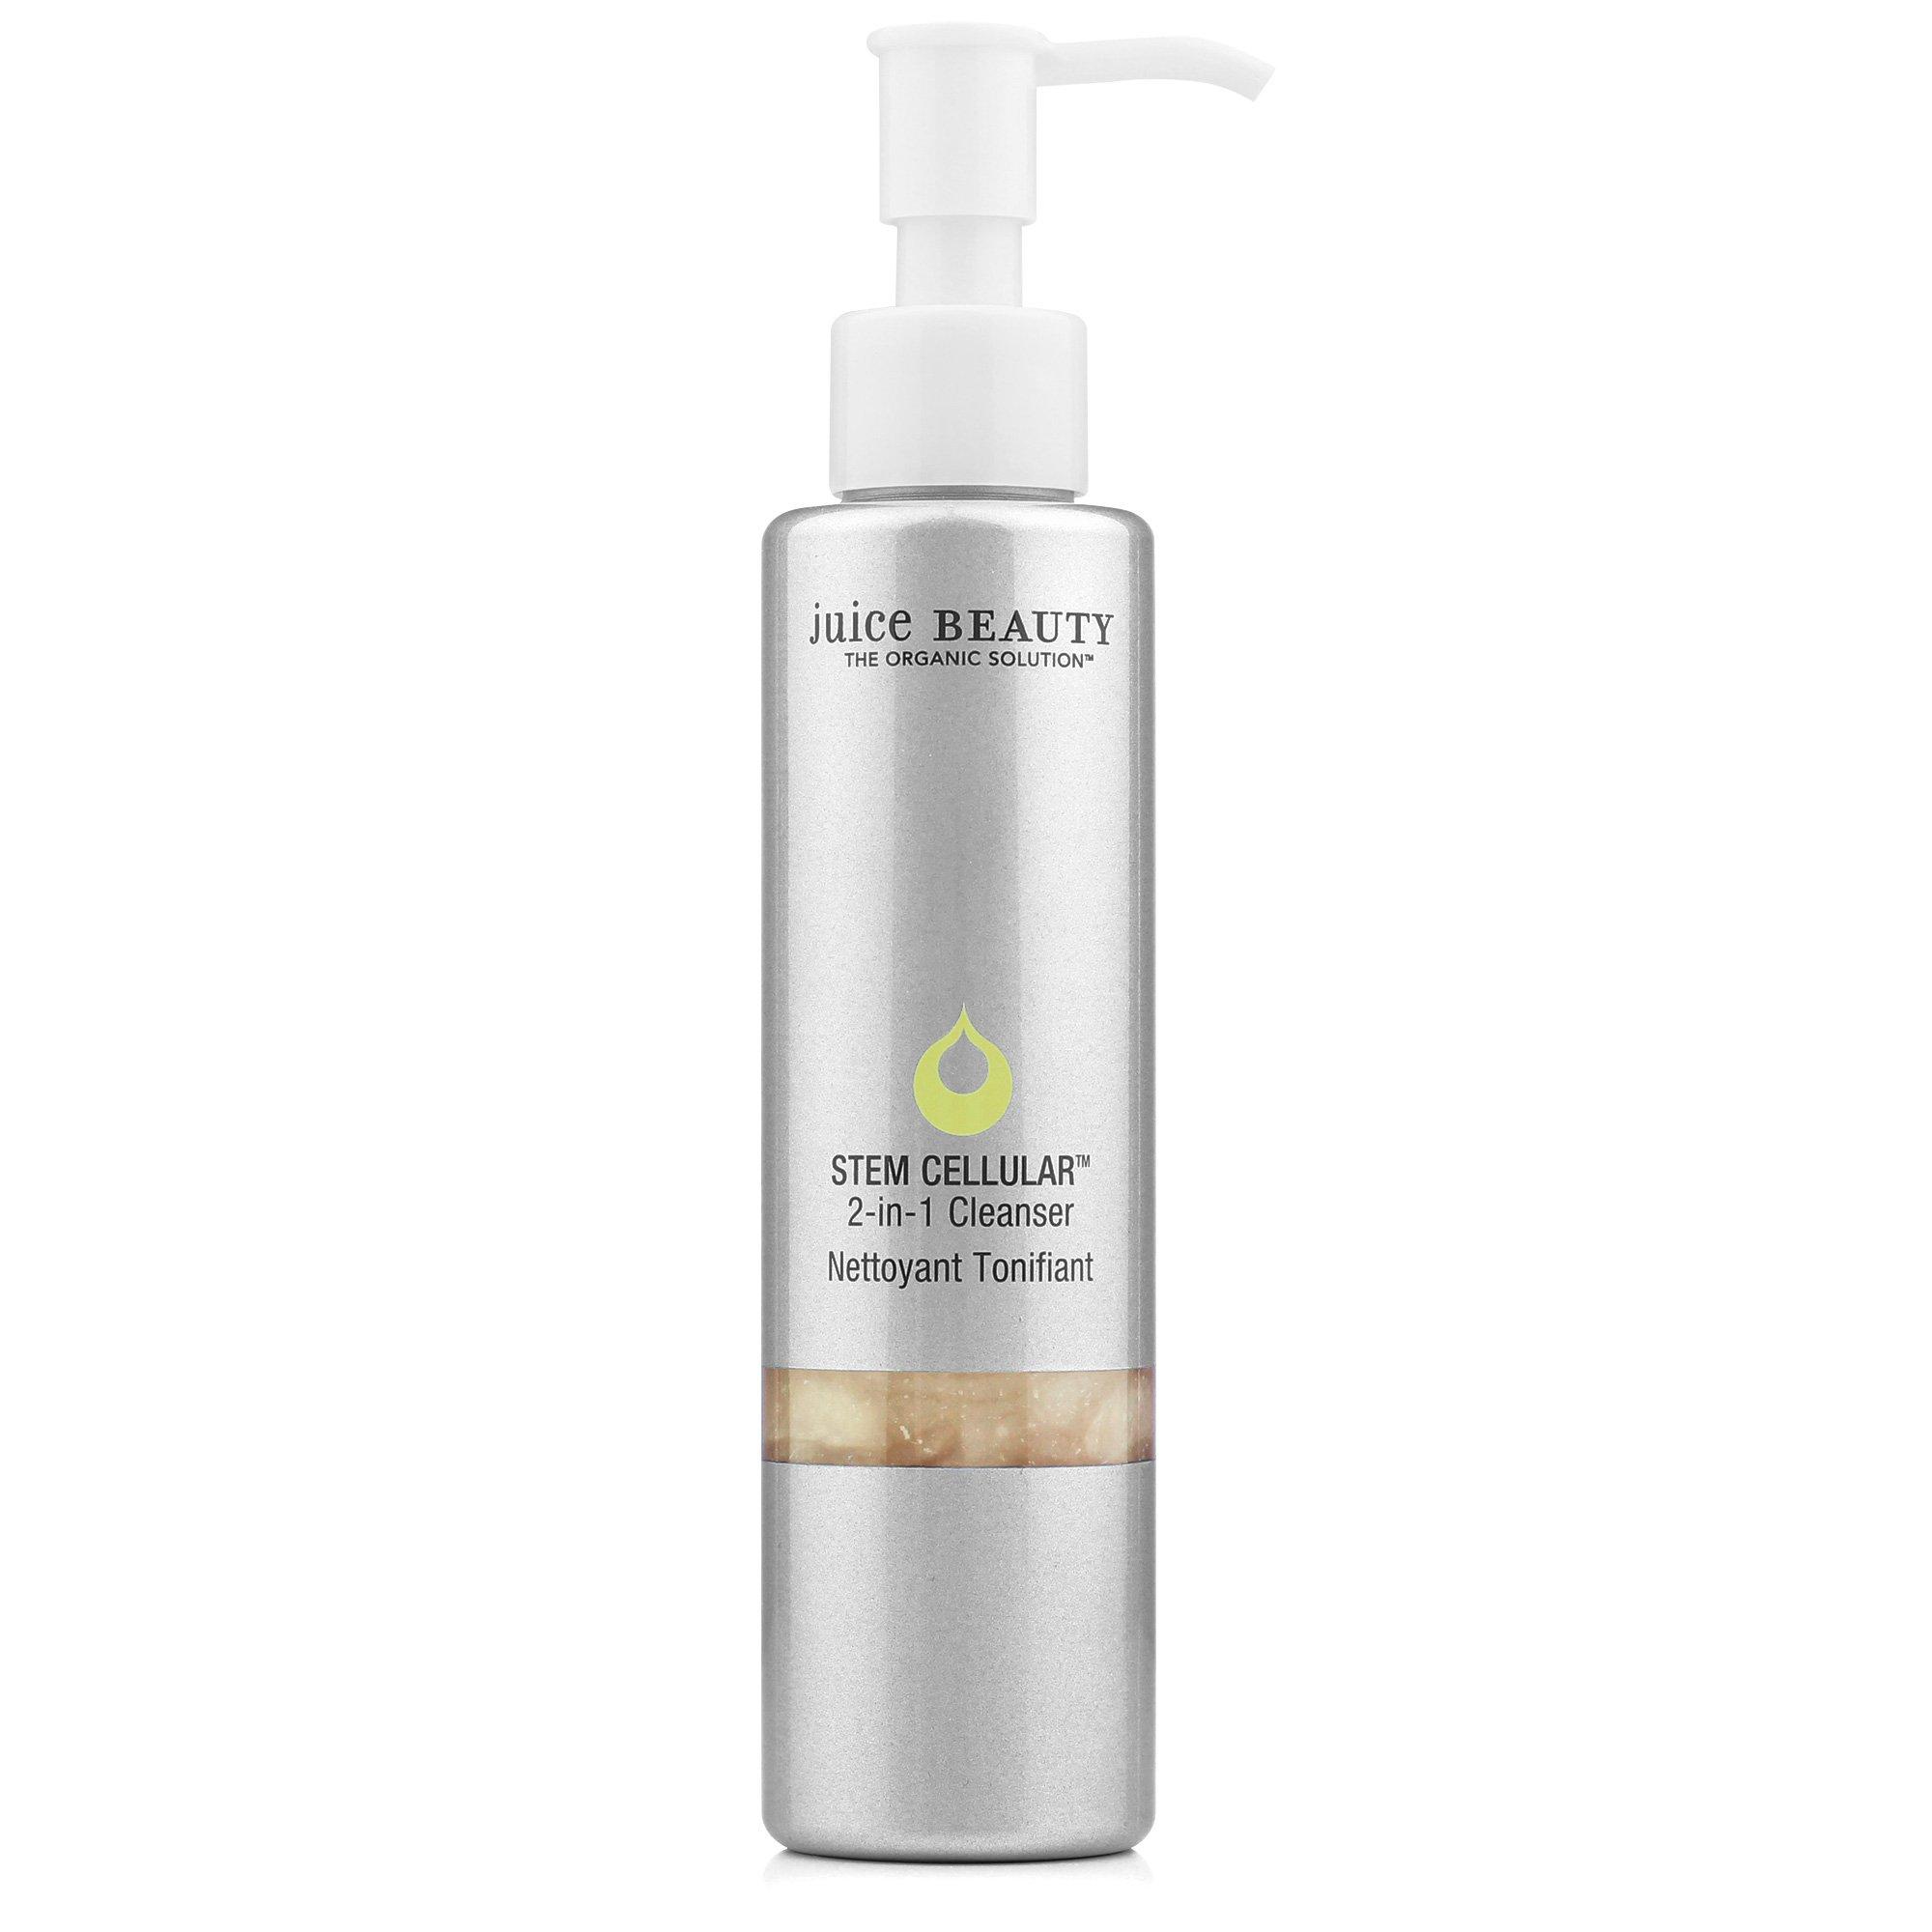 Juice Beauty Stem Cellular 2-in-1 Cleanser, 4.5